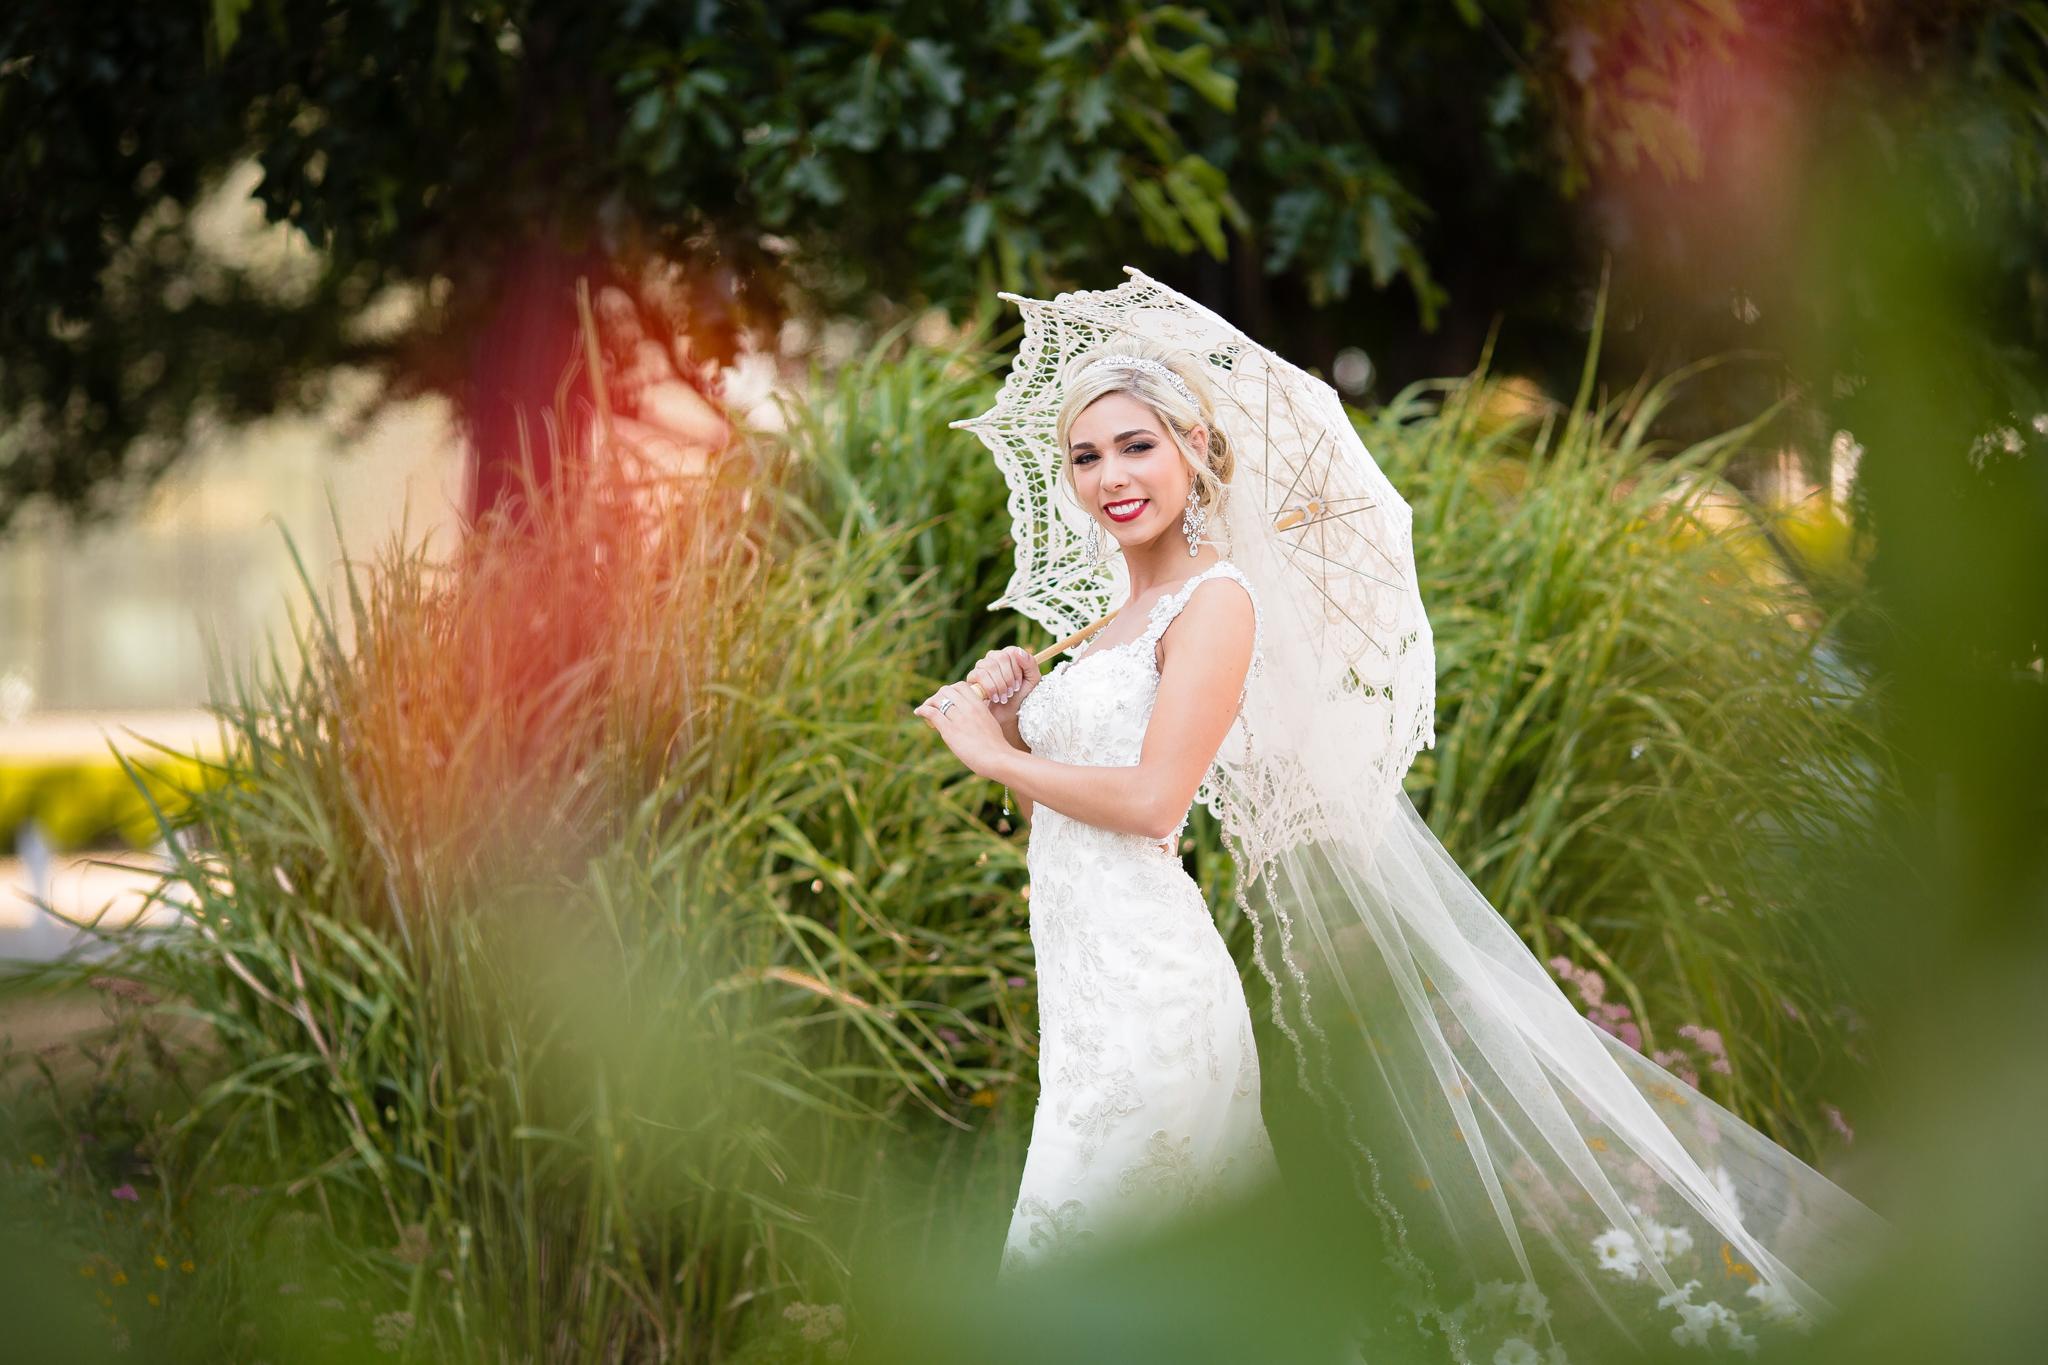 Statler-City-Buffalo-wedding-photographer- 0436.jpg